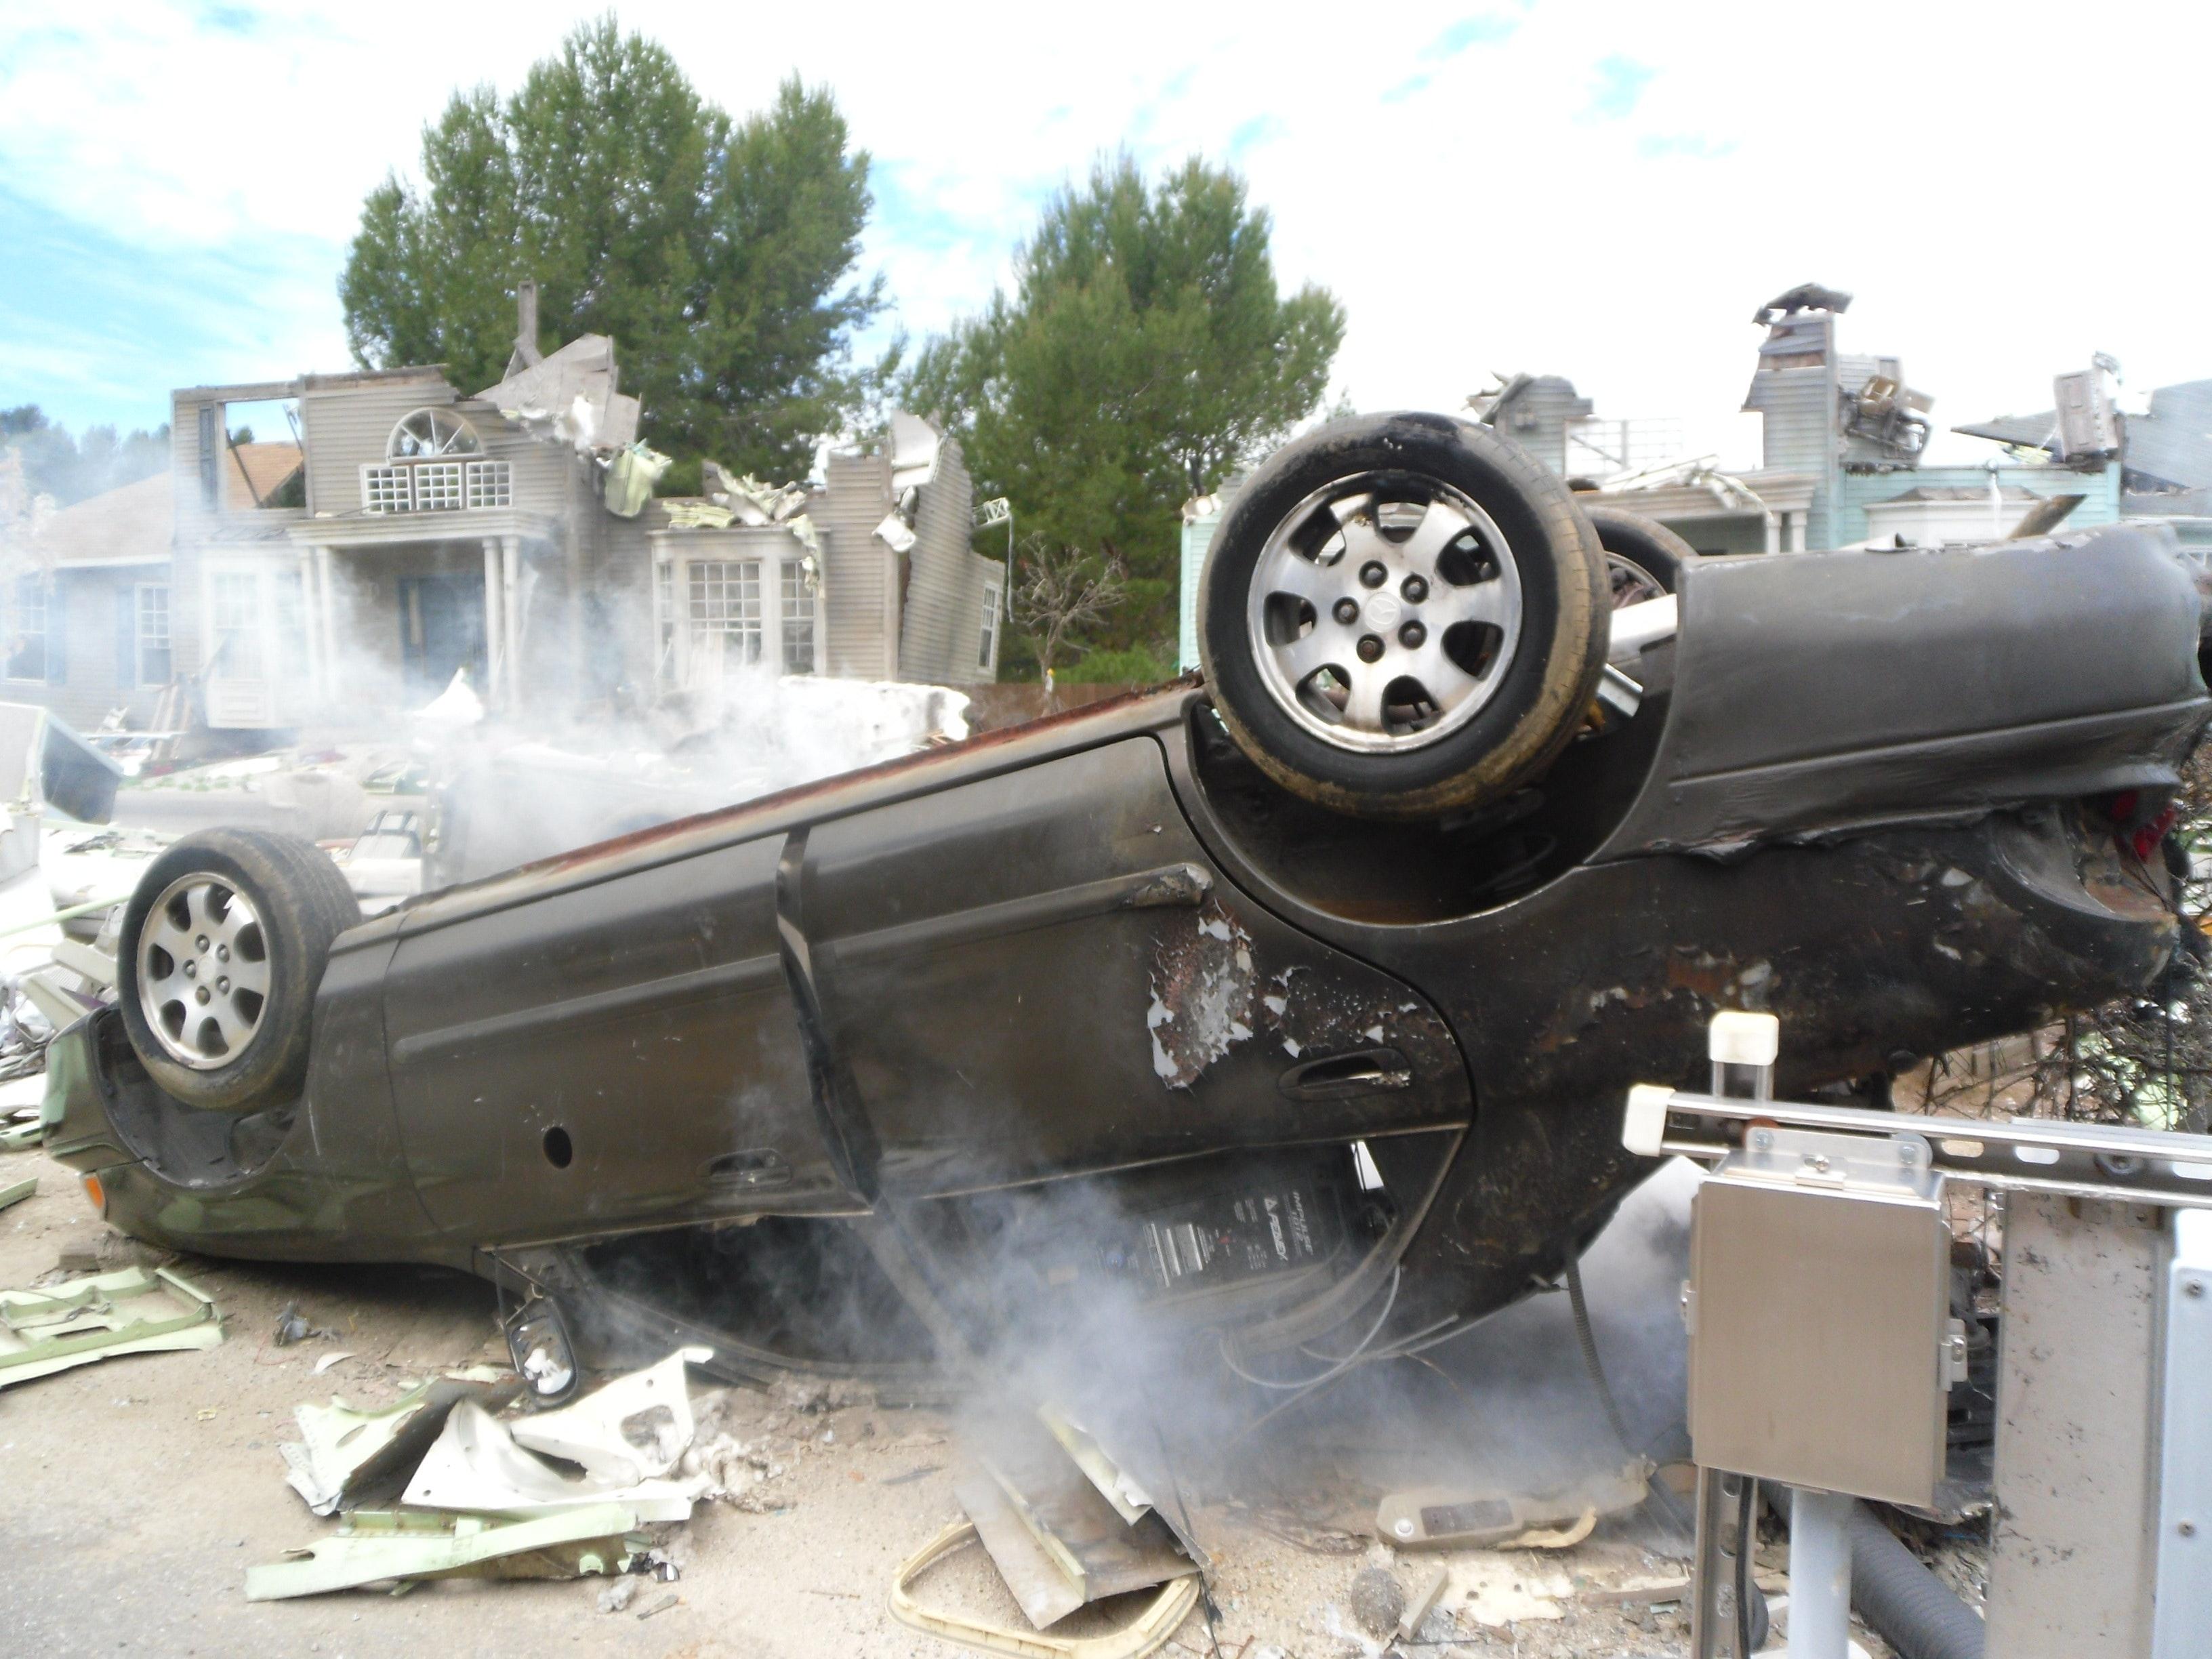 Kostenloses Foto zum Thema: auto, autounfall, dekoration